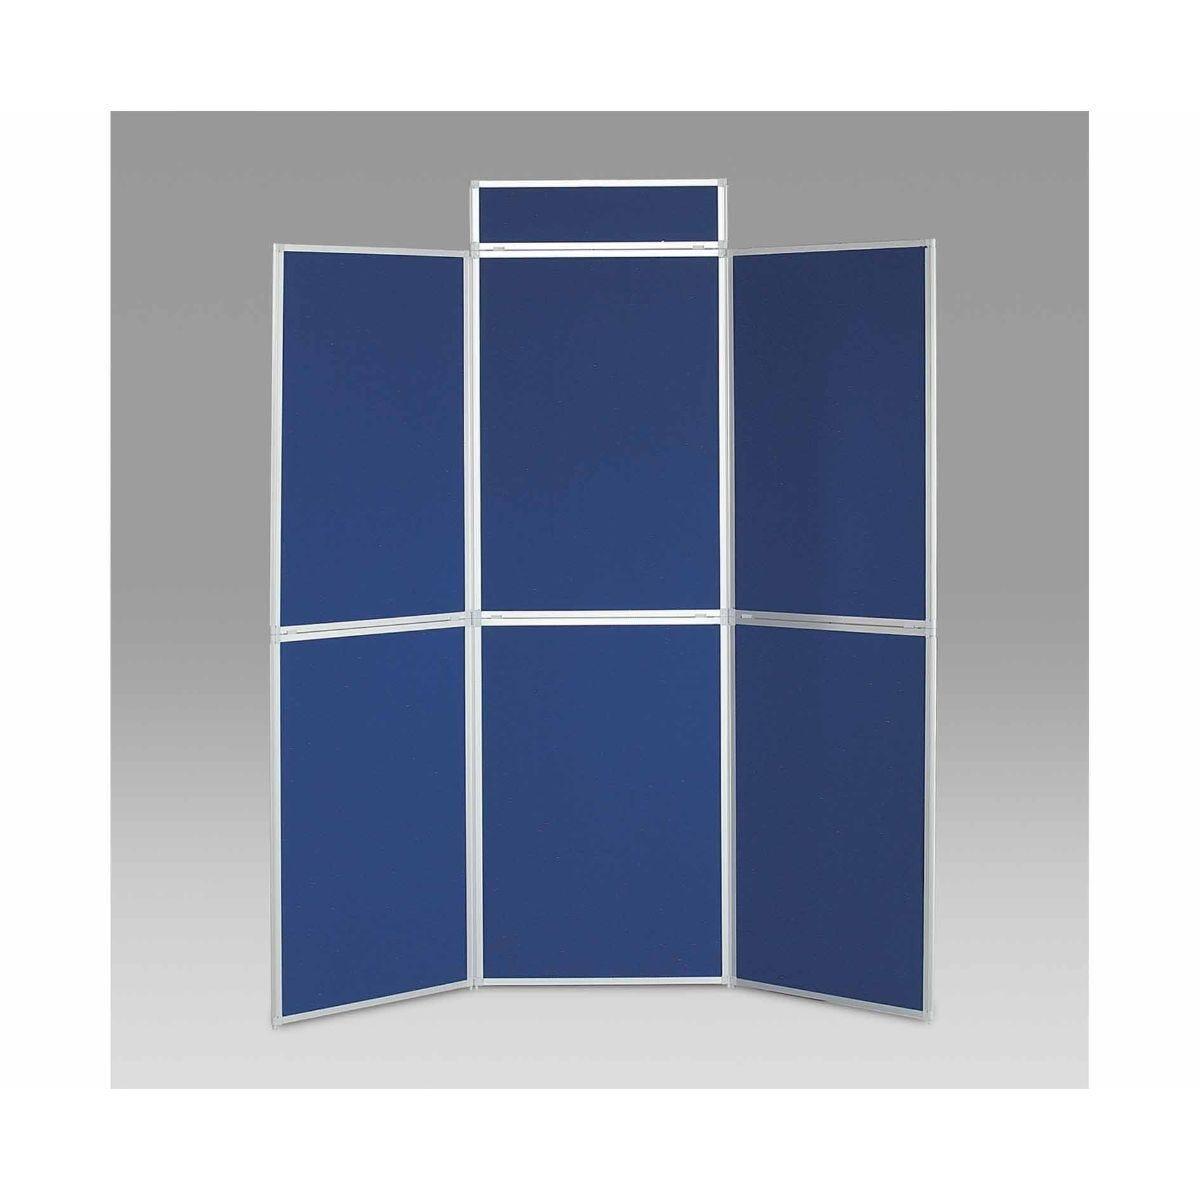 Metroplan BusyFold Aluminium Framed Folding Display 6 Panels